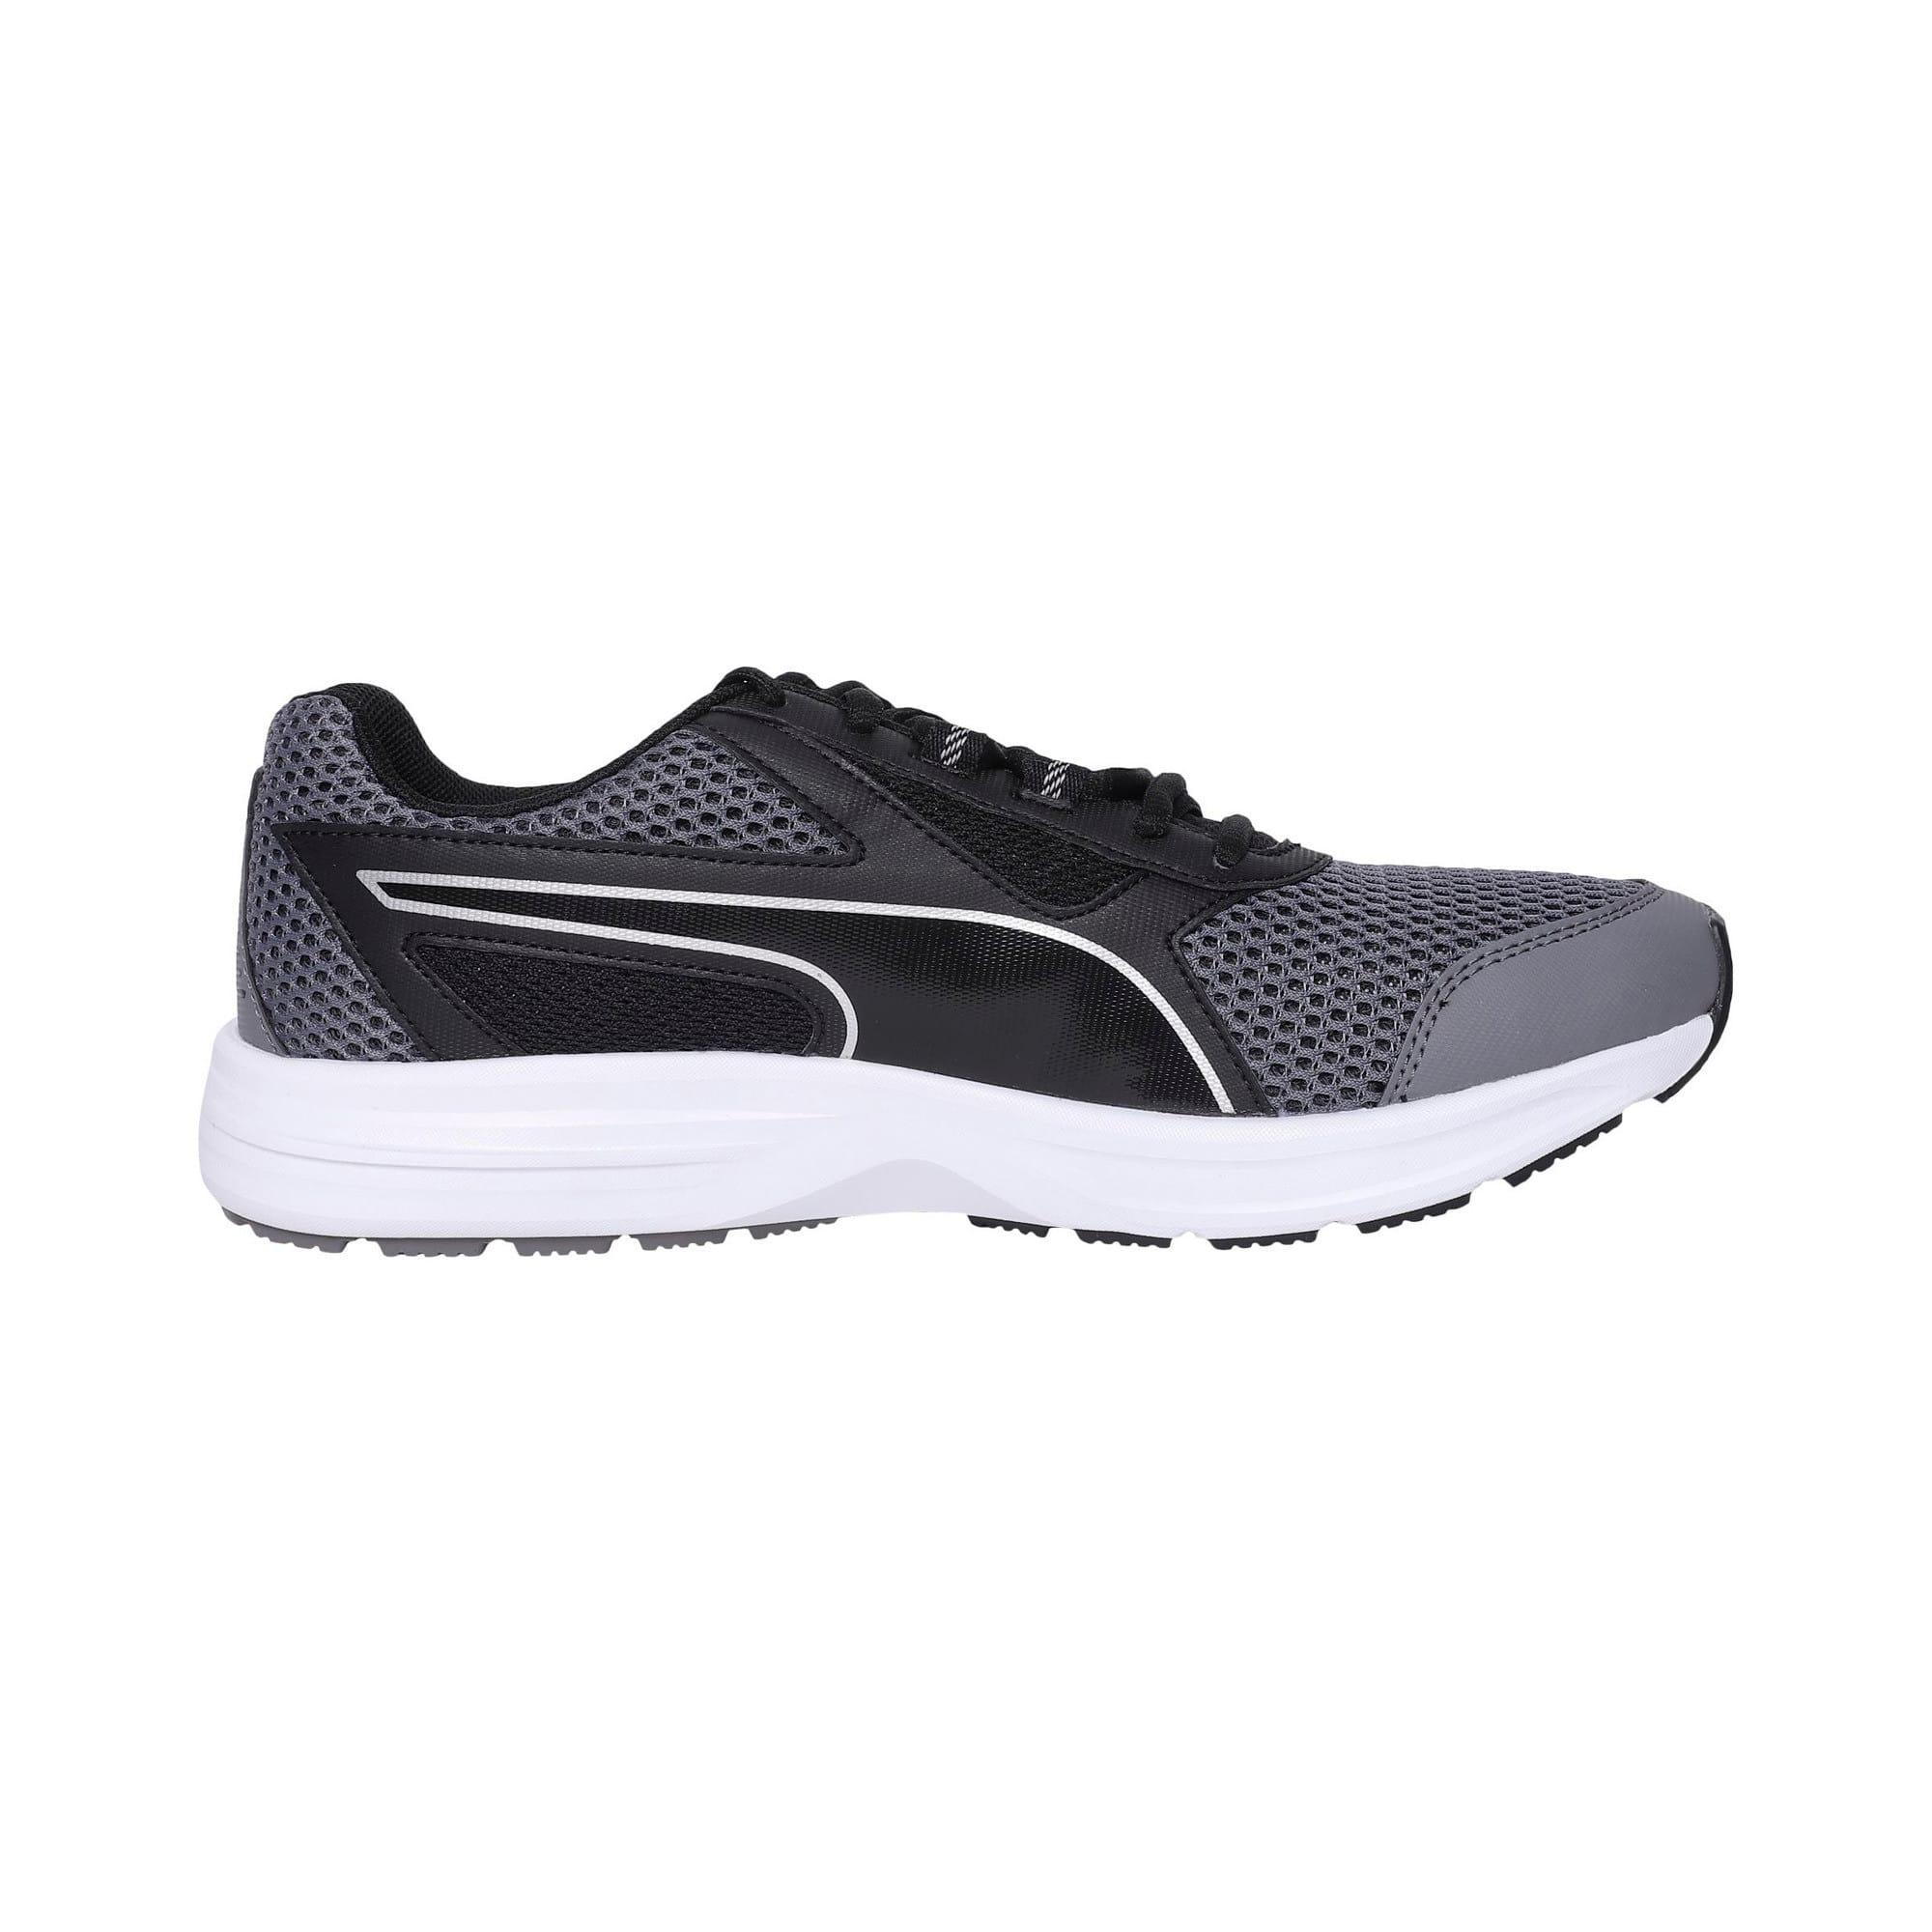 Thumbnail 5 of Essential Runner Men's Running Shoes, QUIET SHADE-Black-Silver, medium-IND